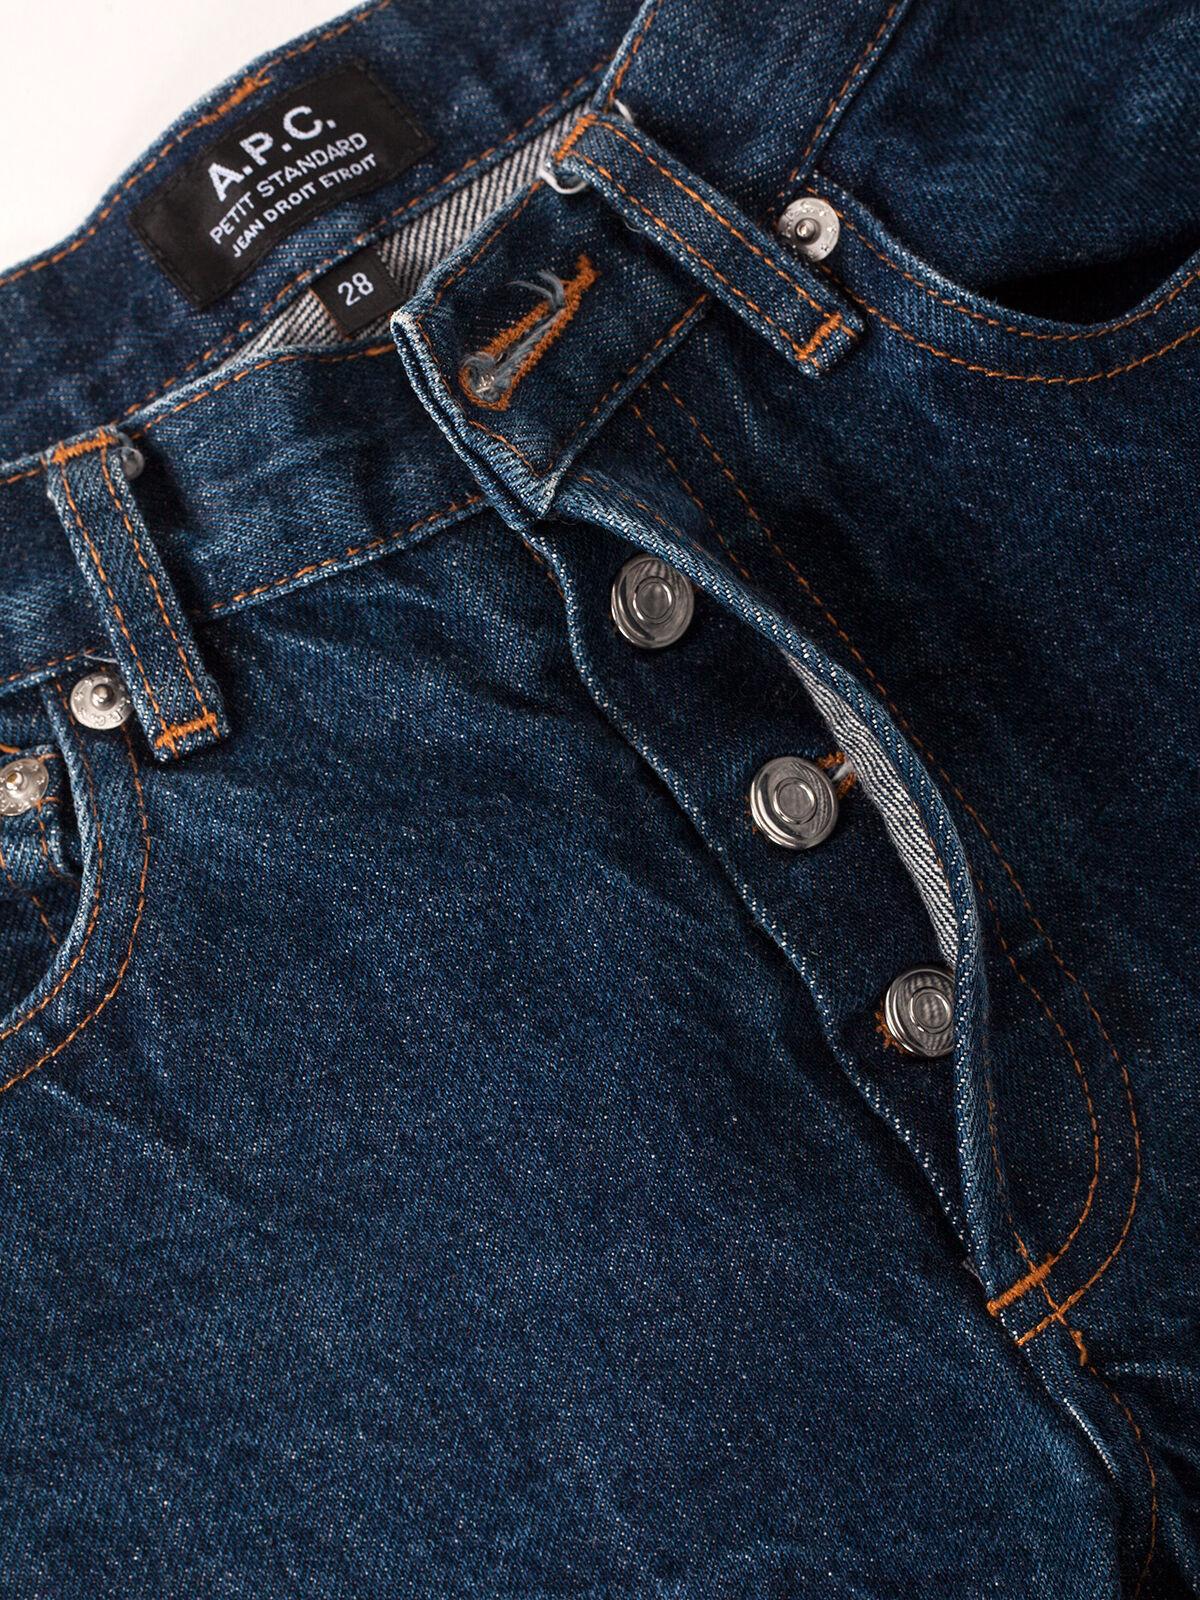 Men's APC Petit Standard Jeans Denim Fade Butler Raw bluee Indigo Skinny Japan 28